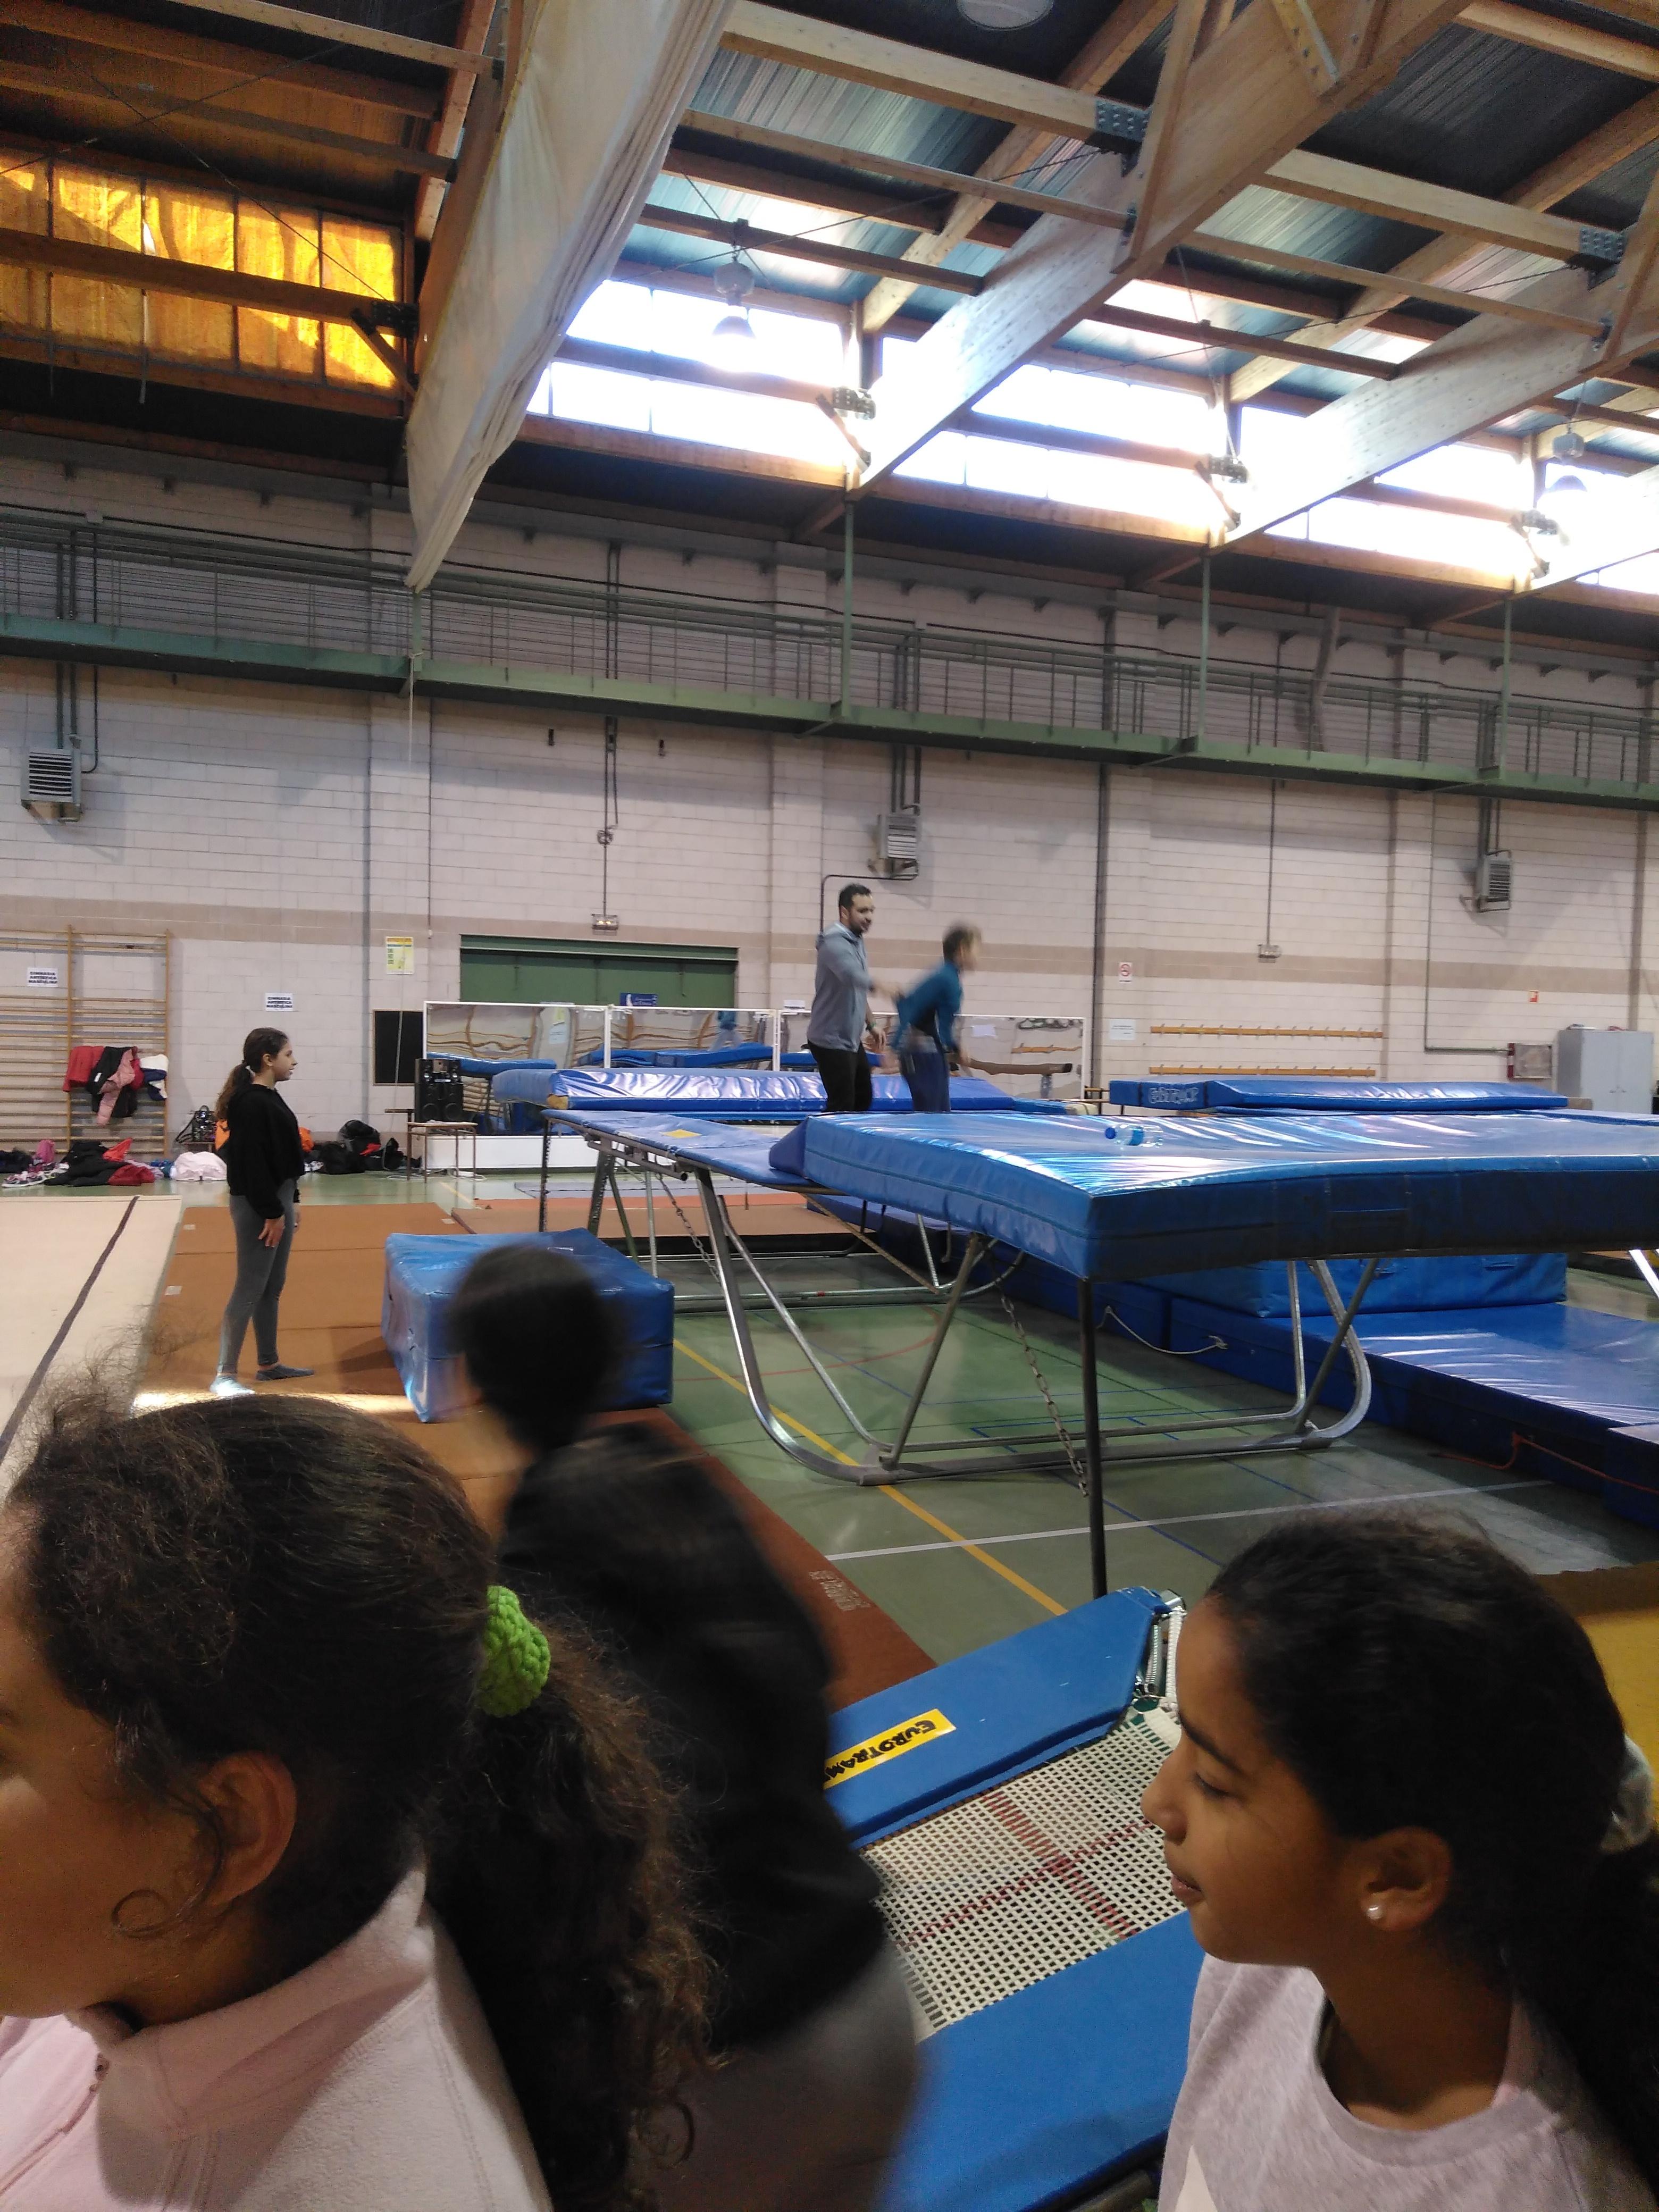 Gimnasia de trampolín 3 13